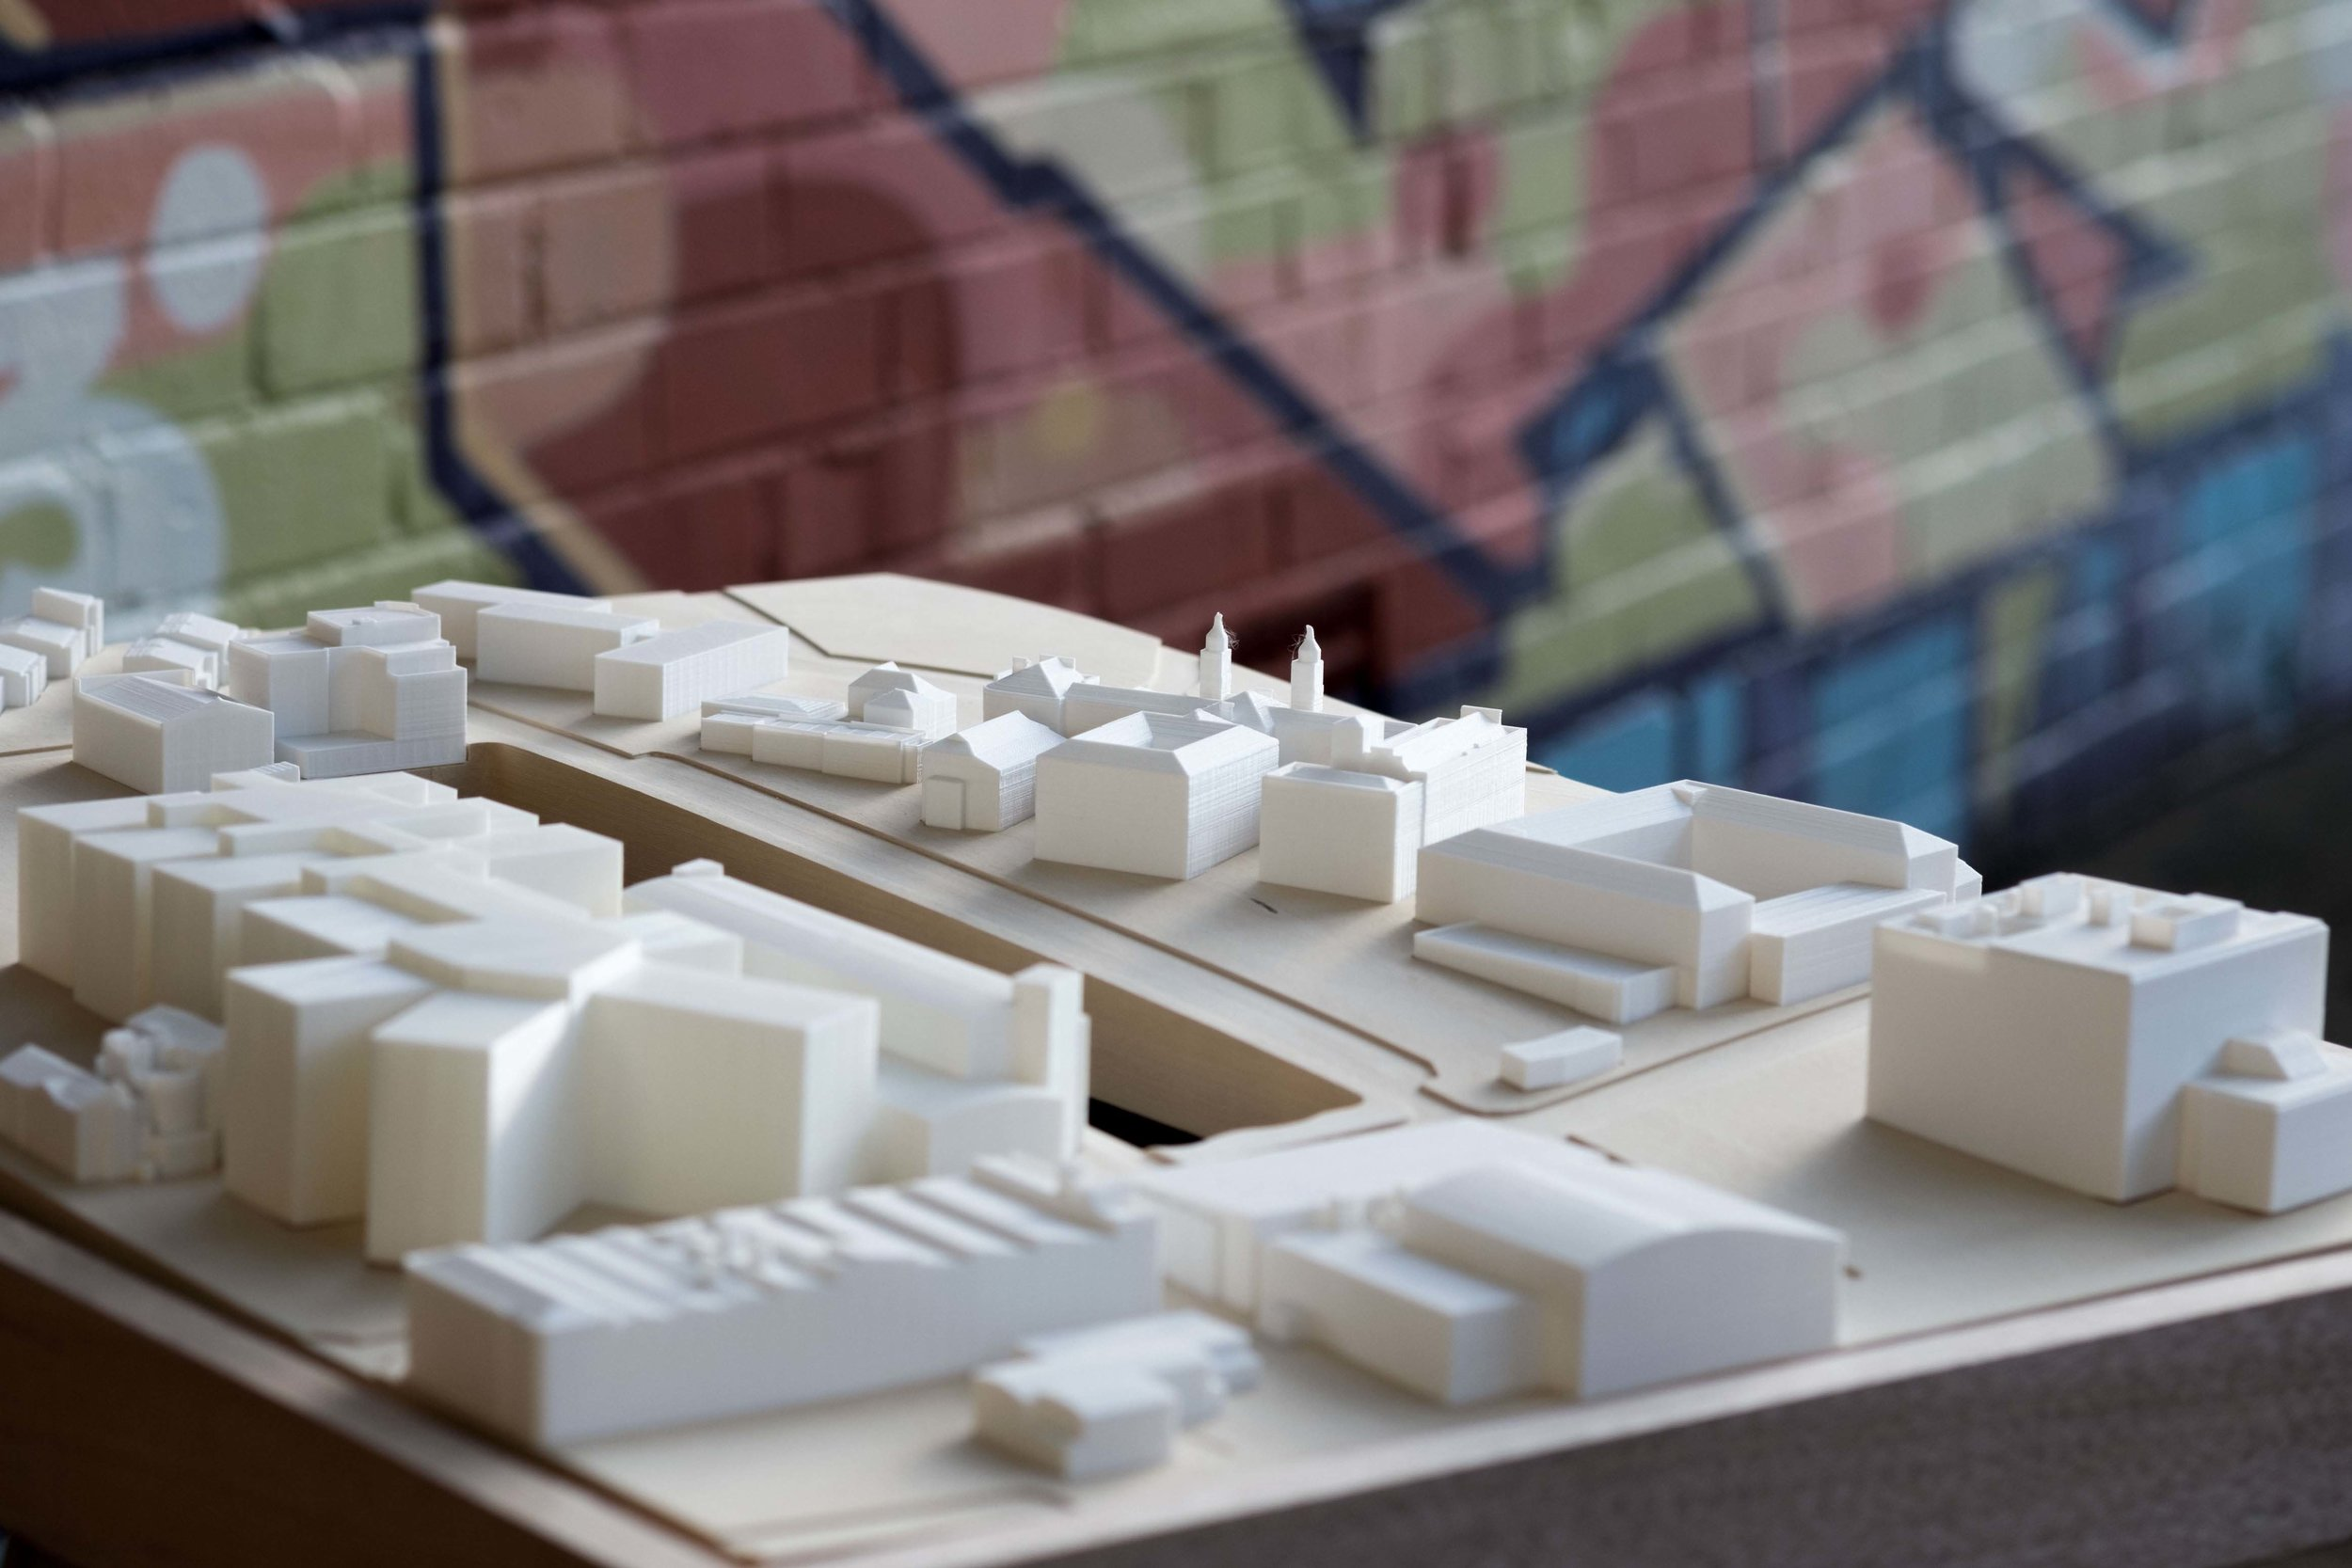 Sydney_da_MODEL_CNC_architecture_timber_make_models_fabrication_sydney_CityofSydney-2.jpg